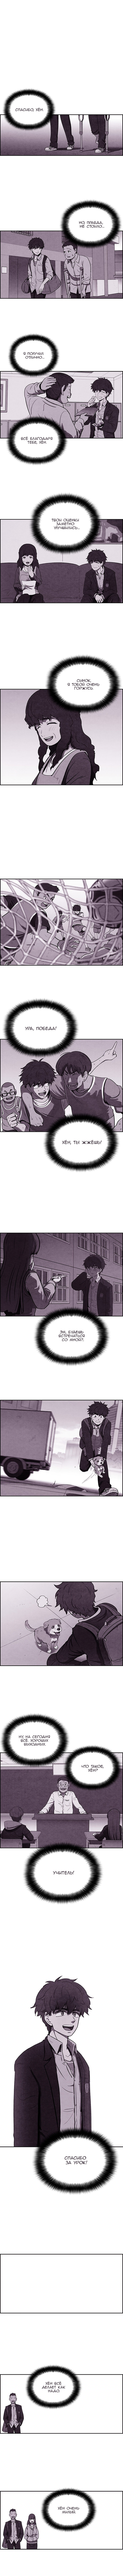 https://r1.ninemanga.com/comics/pic2/26/33050/415976/1532297797142.jpg Page 2